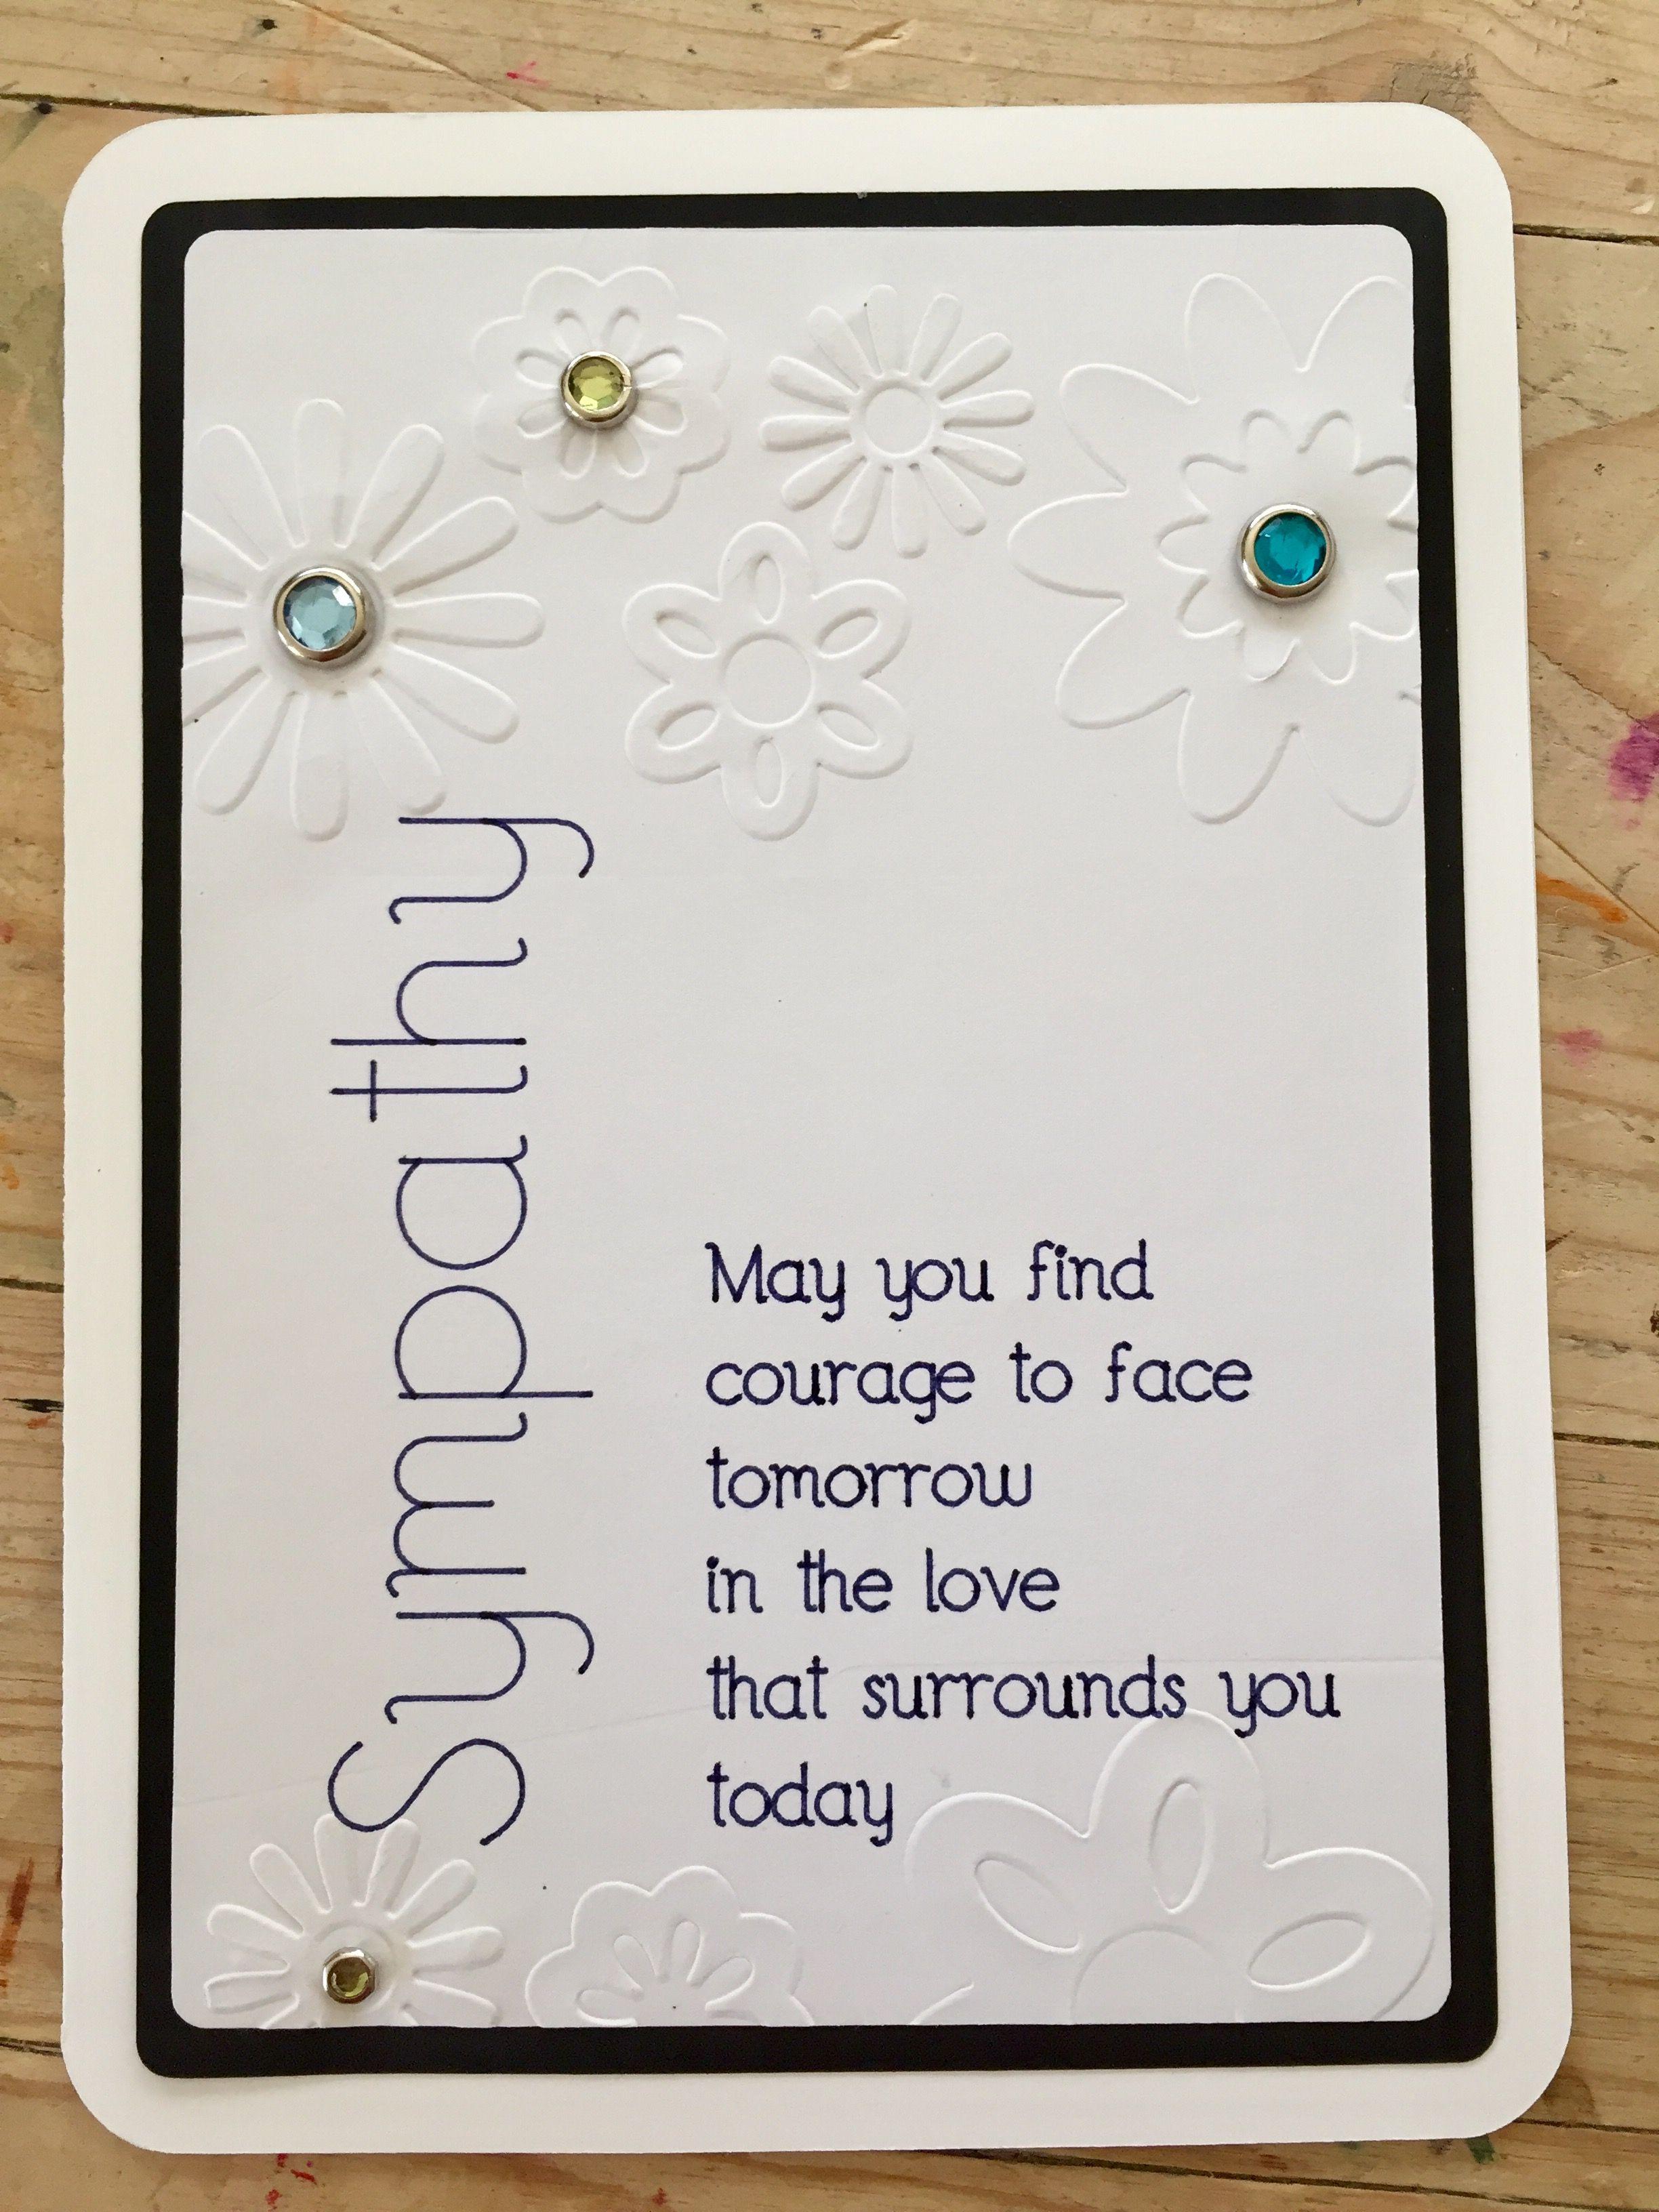 Cricut Sympathy Card Condolences Card White Embossed Jeweled Flowers Condolence Card Cricut Cards Sympathy Cards